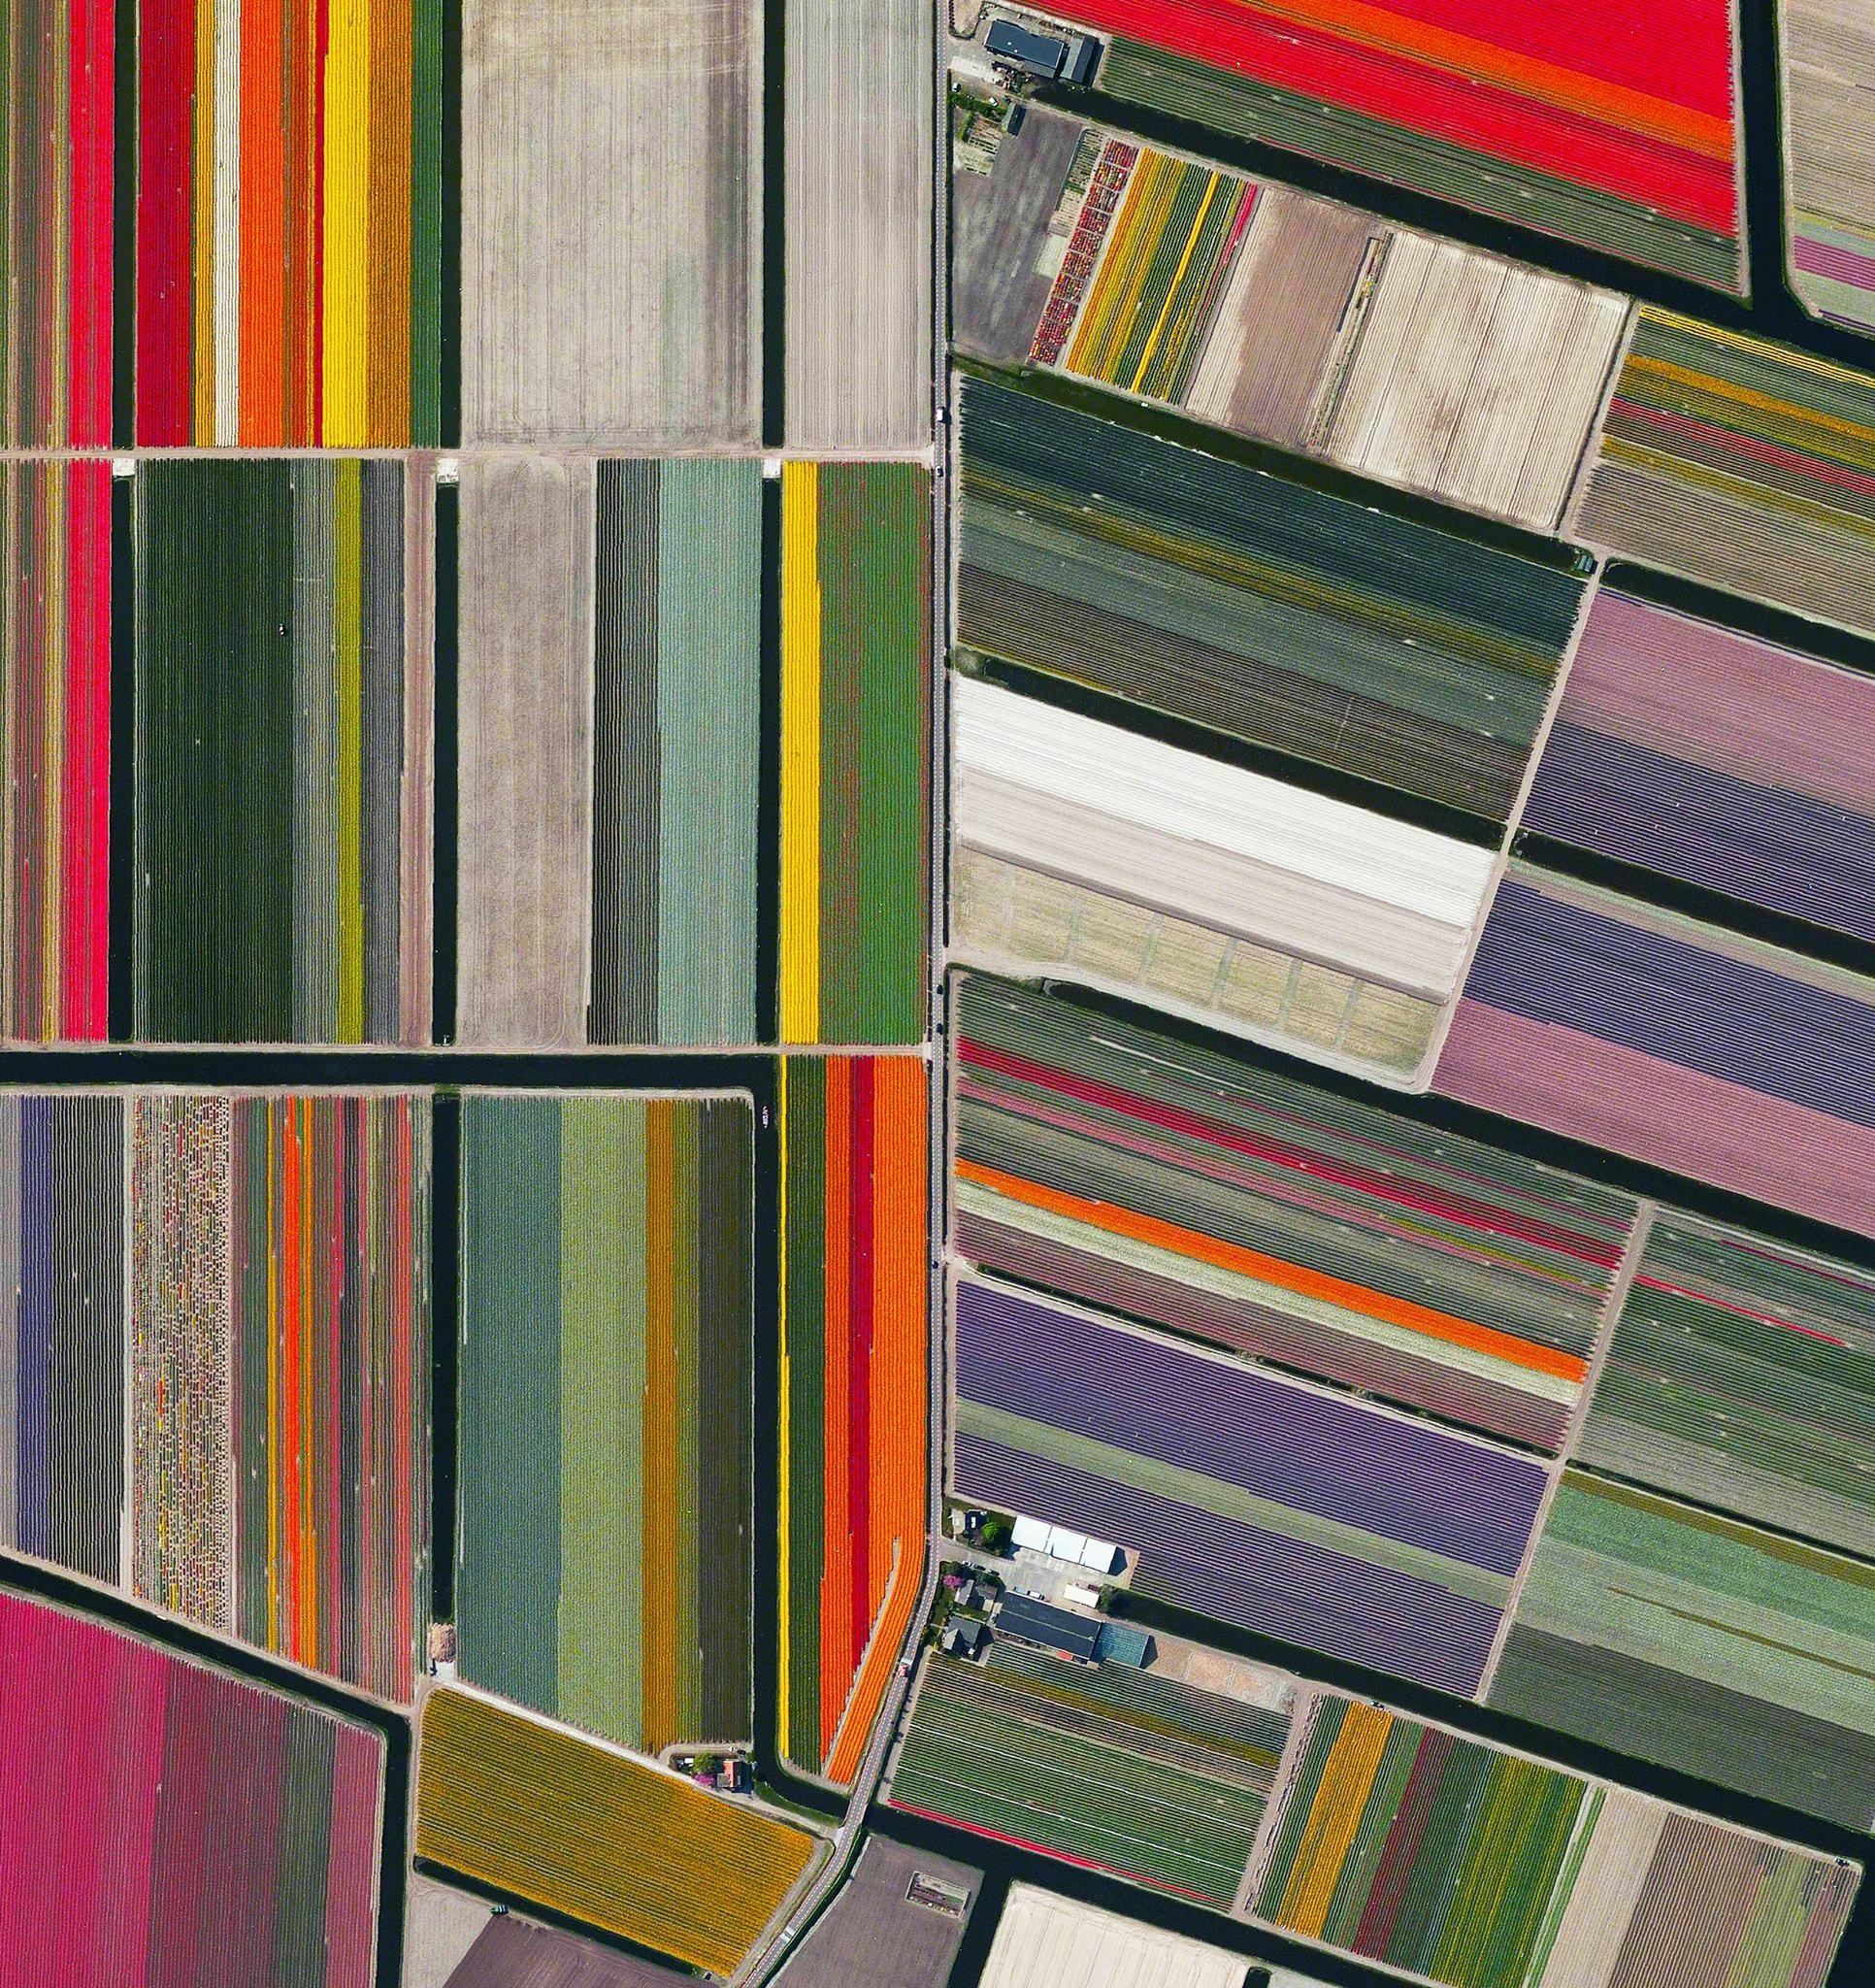 Tulip farm in the Netherlands satellite photo